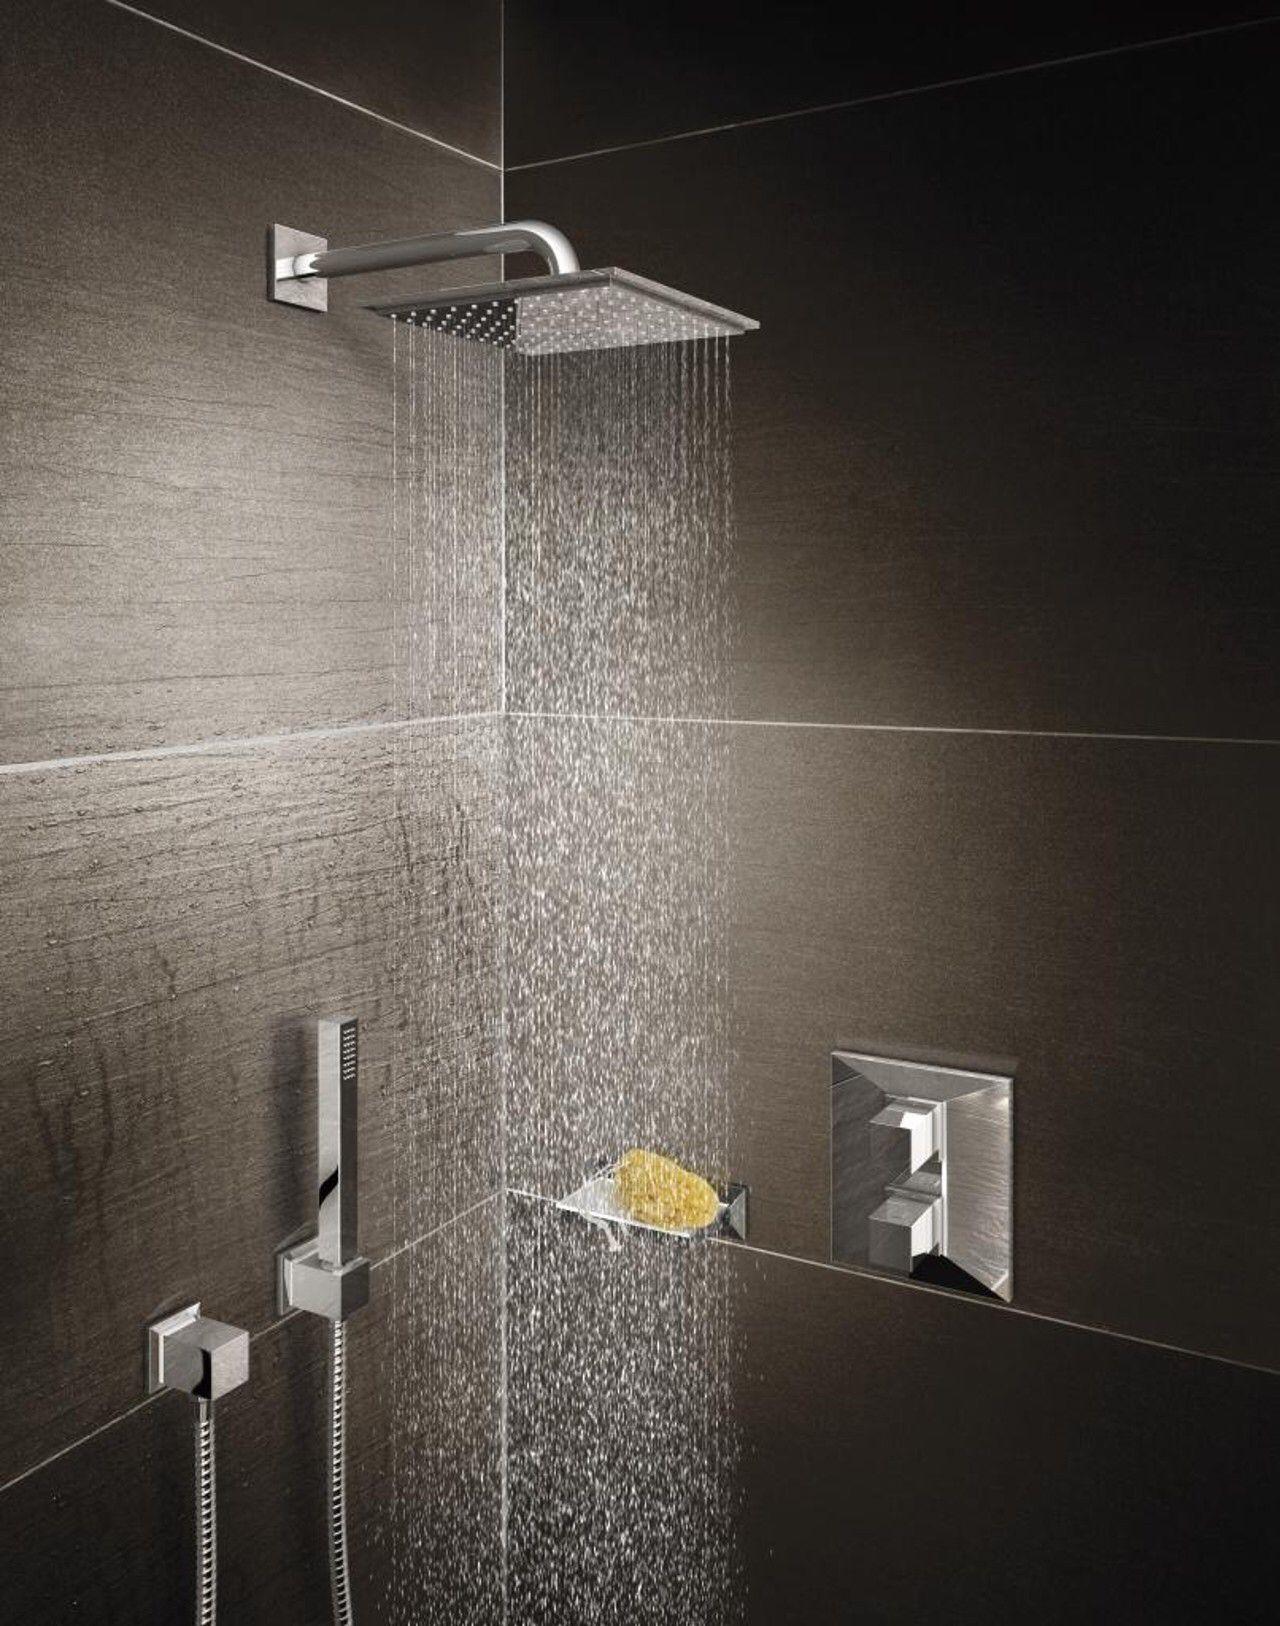 Pin by Pierce Hardware on A Proper Bath | Pinterest | Bathroom ...